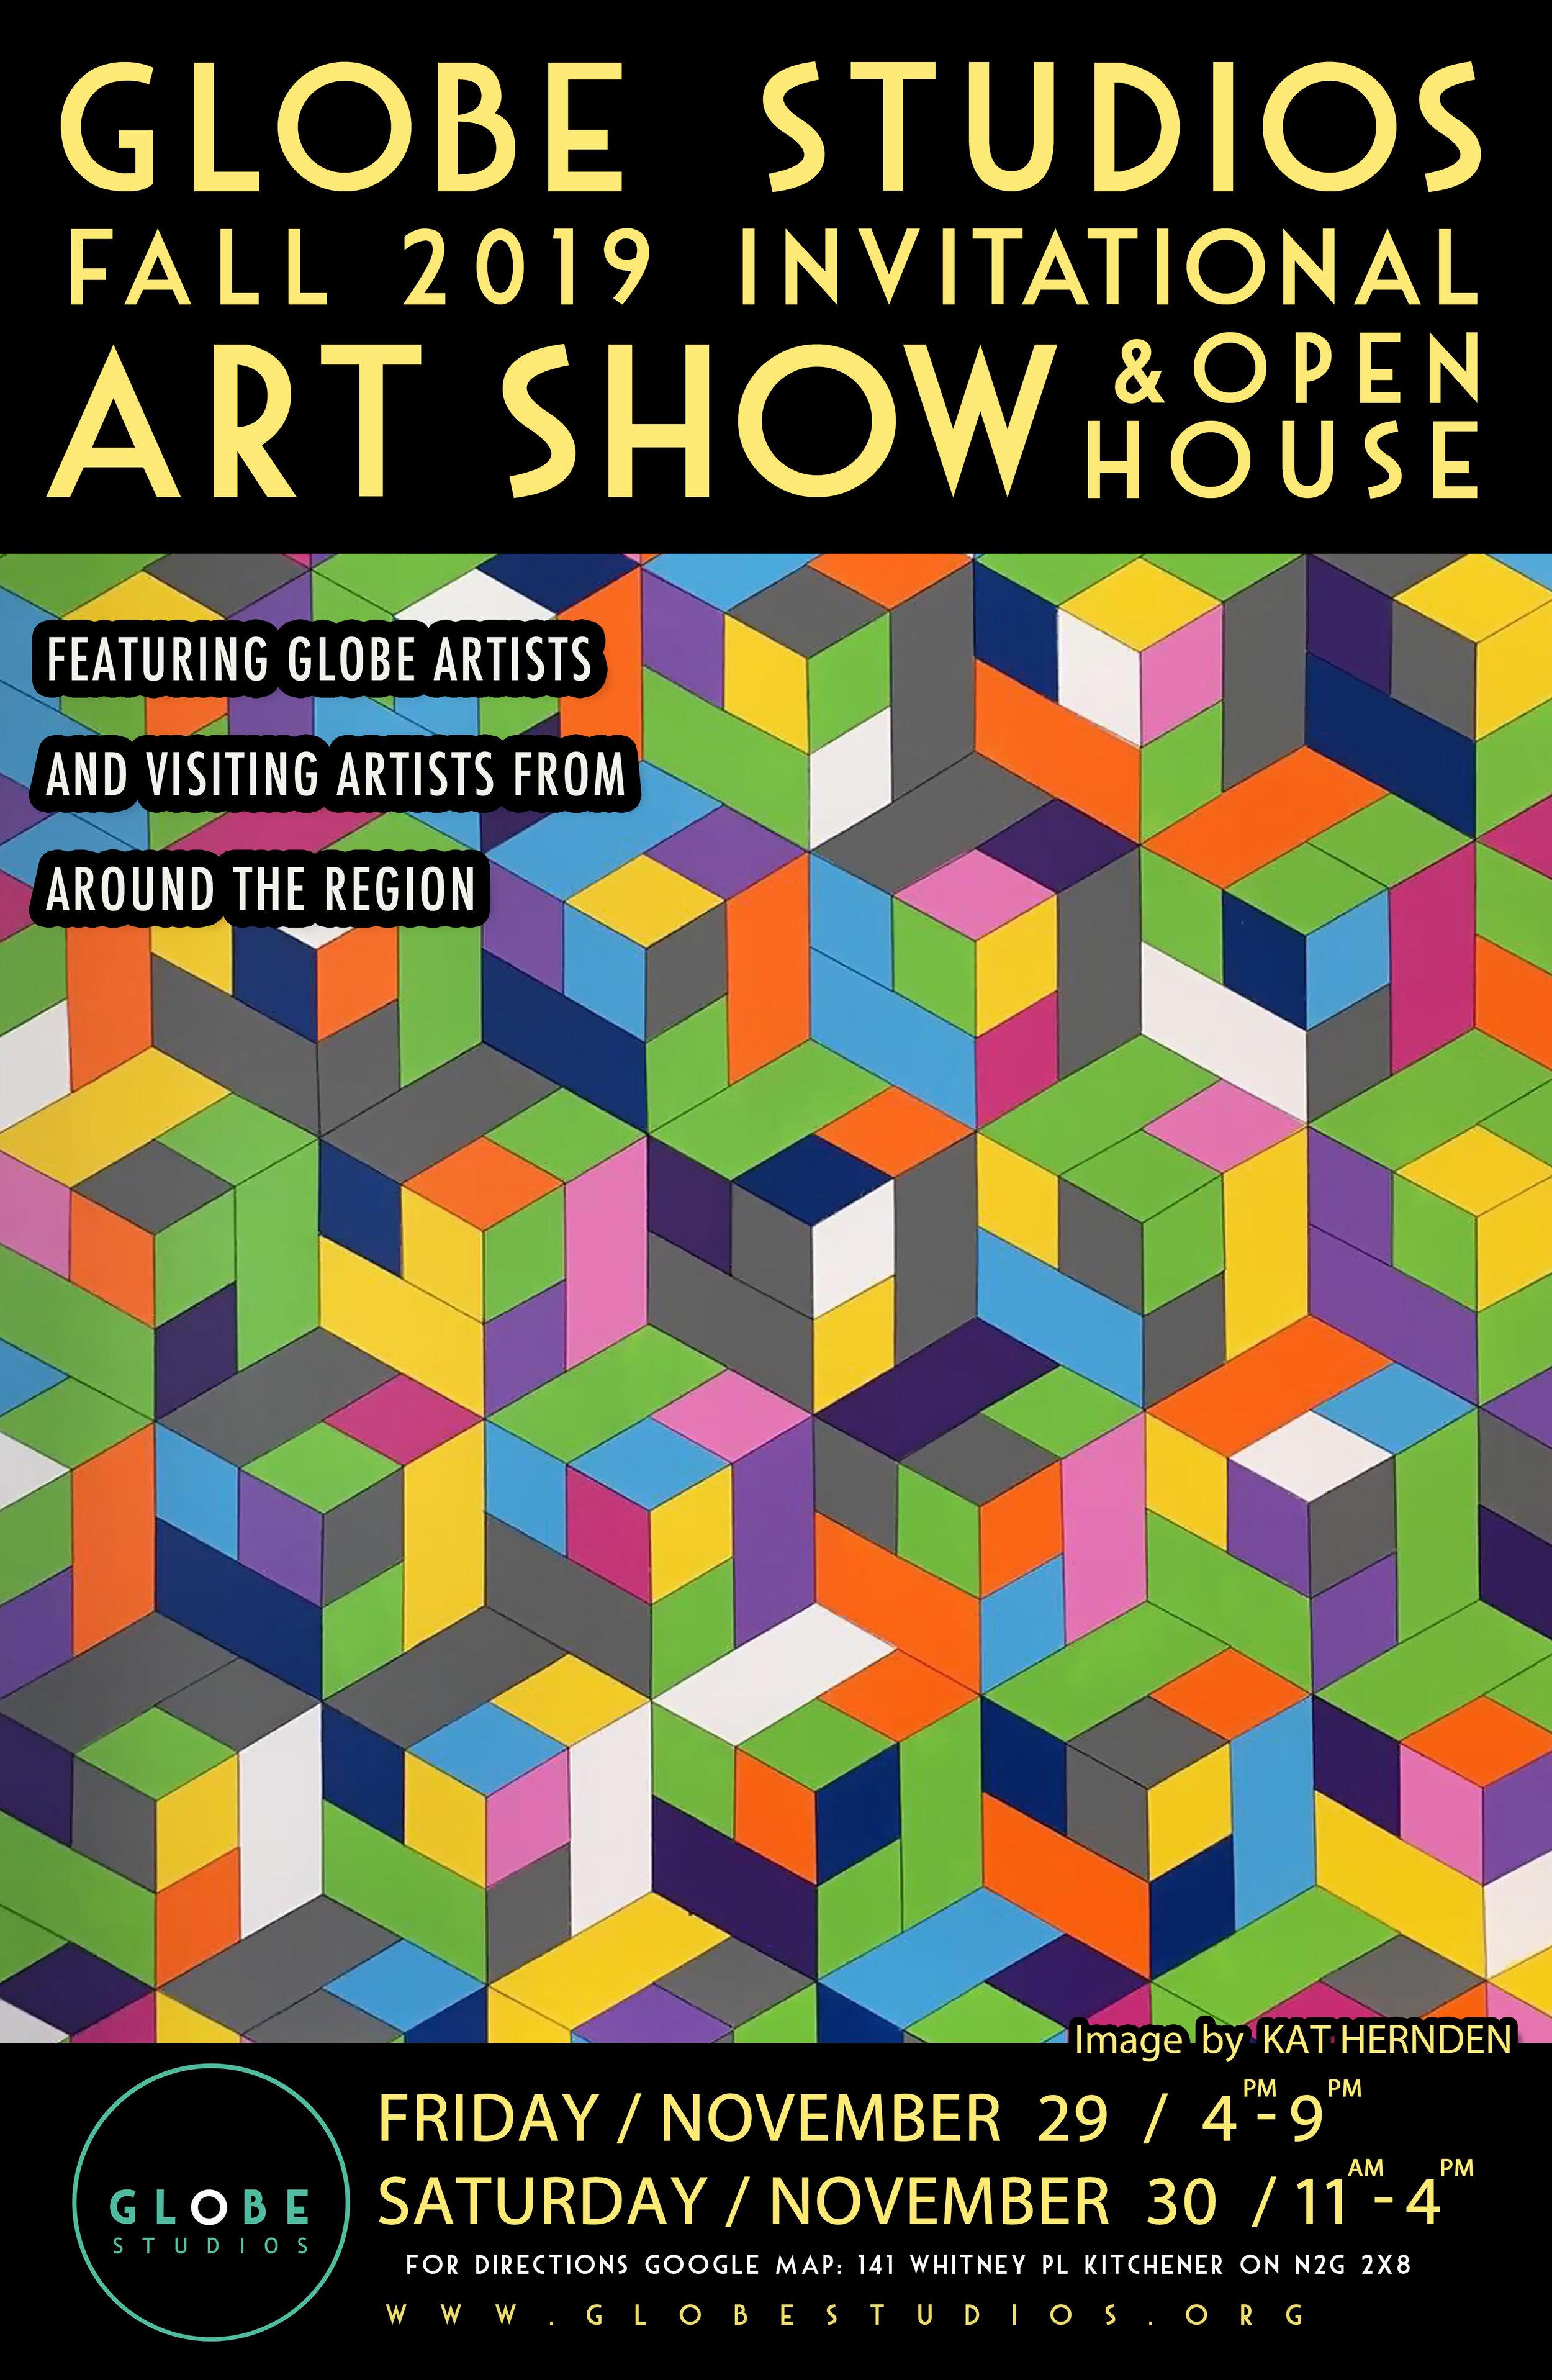 Globe Studios Fall Invitational Art Show and Open House - 141 Whitney Place, Kitchener ONFriday, November 29, 4 pm - 9 pmSaturday, November 30, 11 am - 4 pm